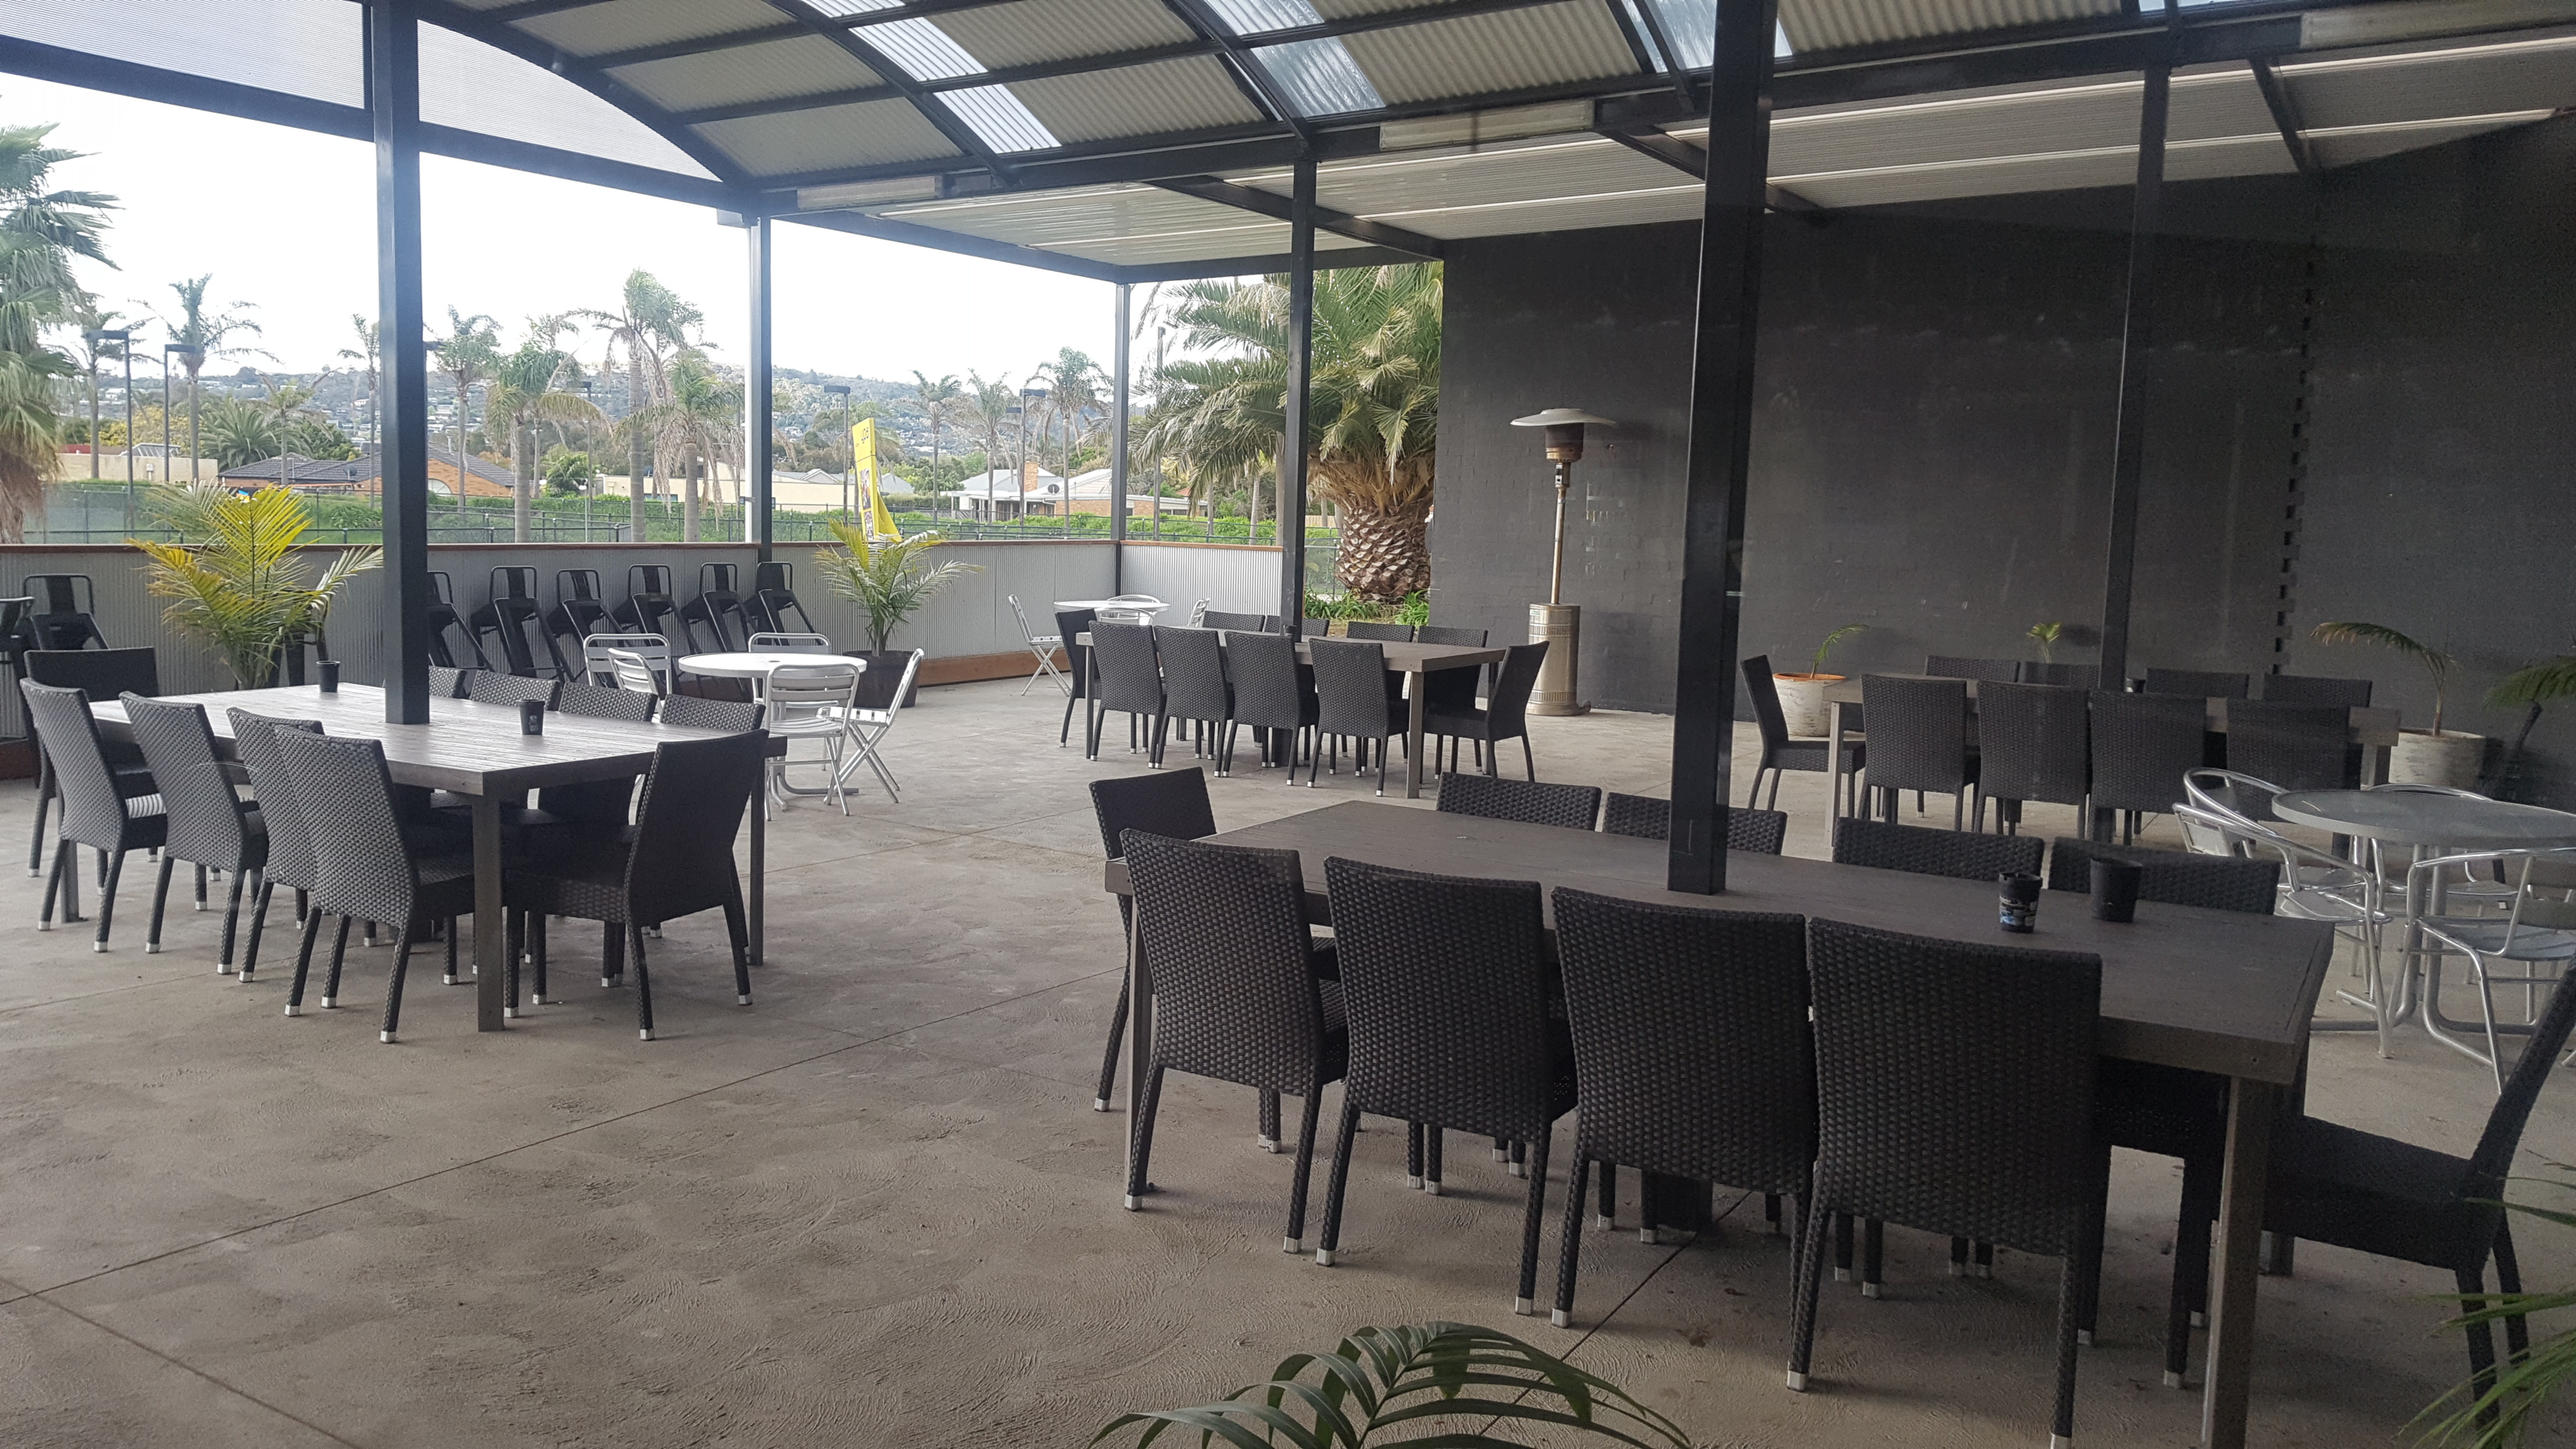 Atrium | 10 Country Club Drive, Safety Beach, Victoria 3936 | +61 3 5981 8123